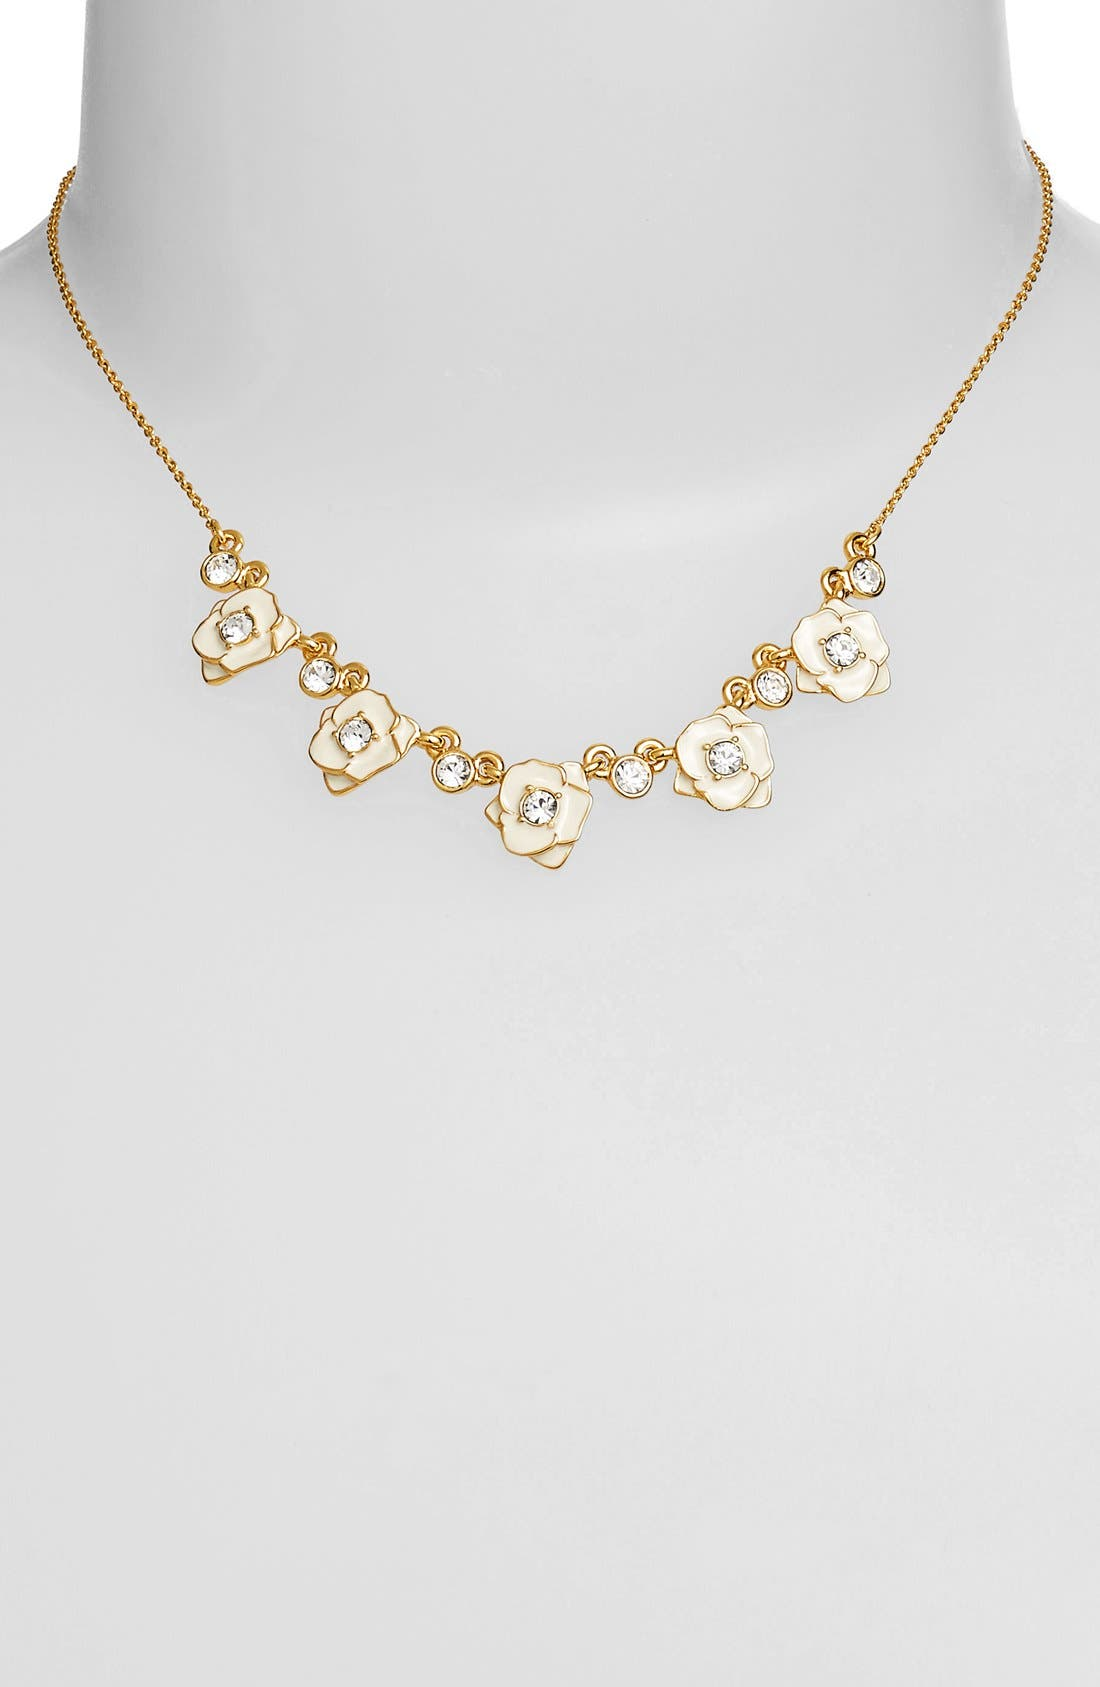 Main Image - kate spade new york 'rose garden' mini collar necklace